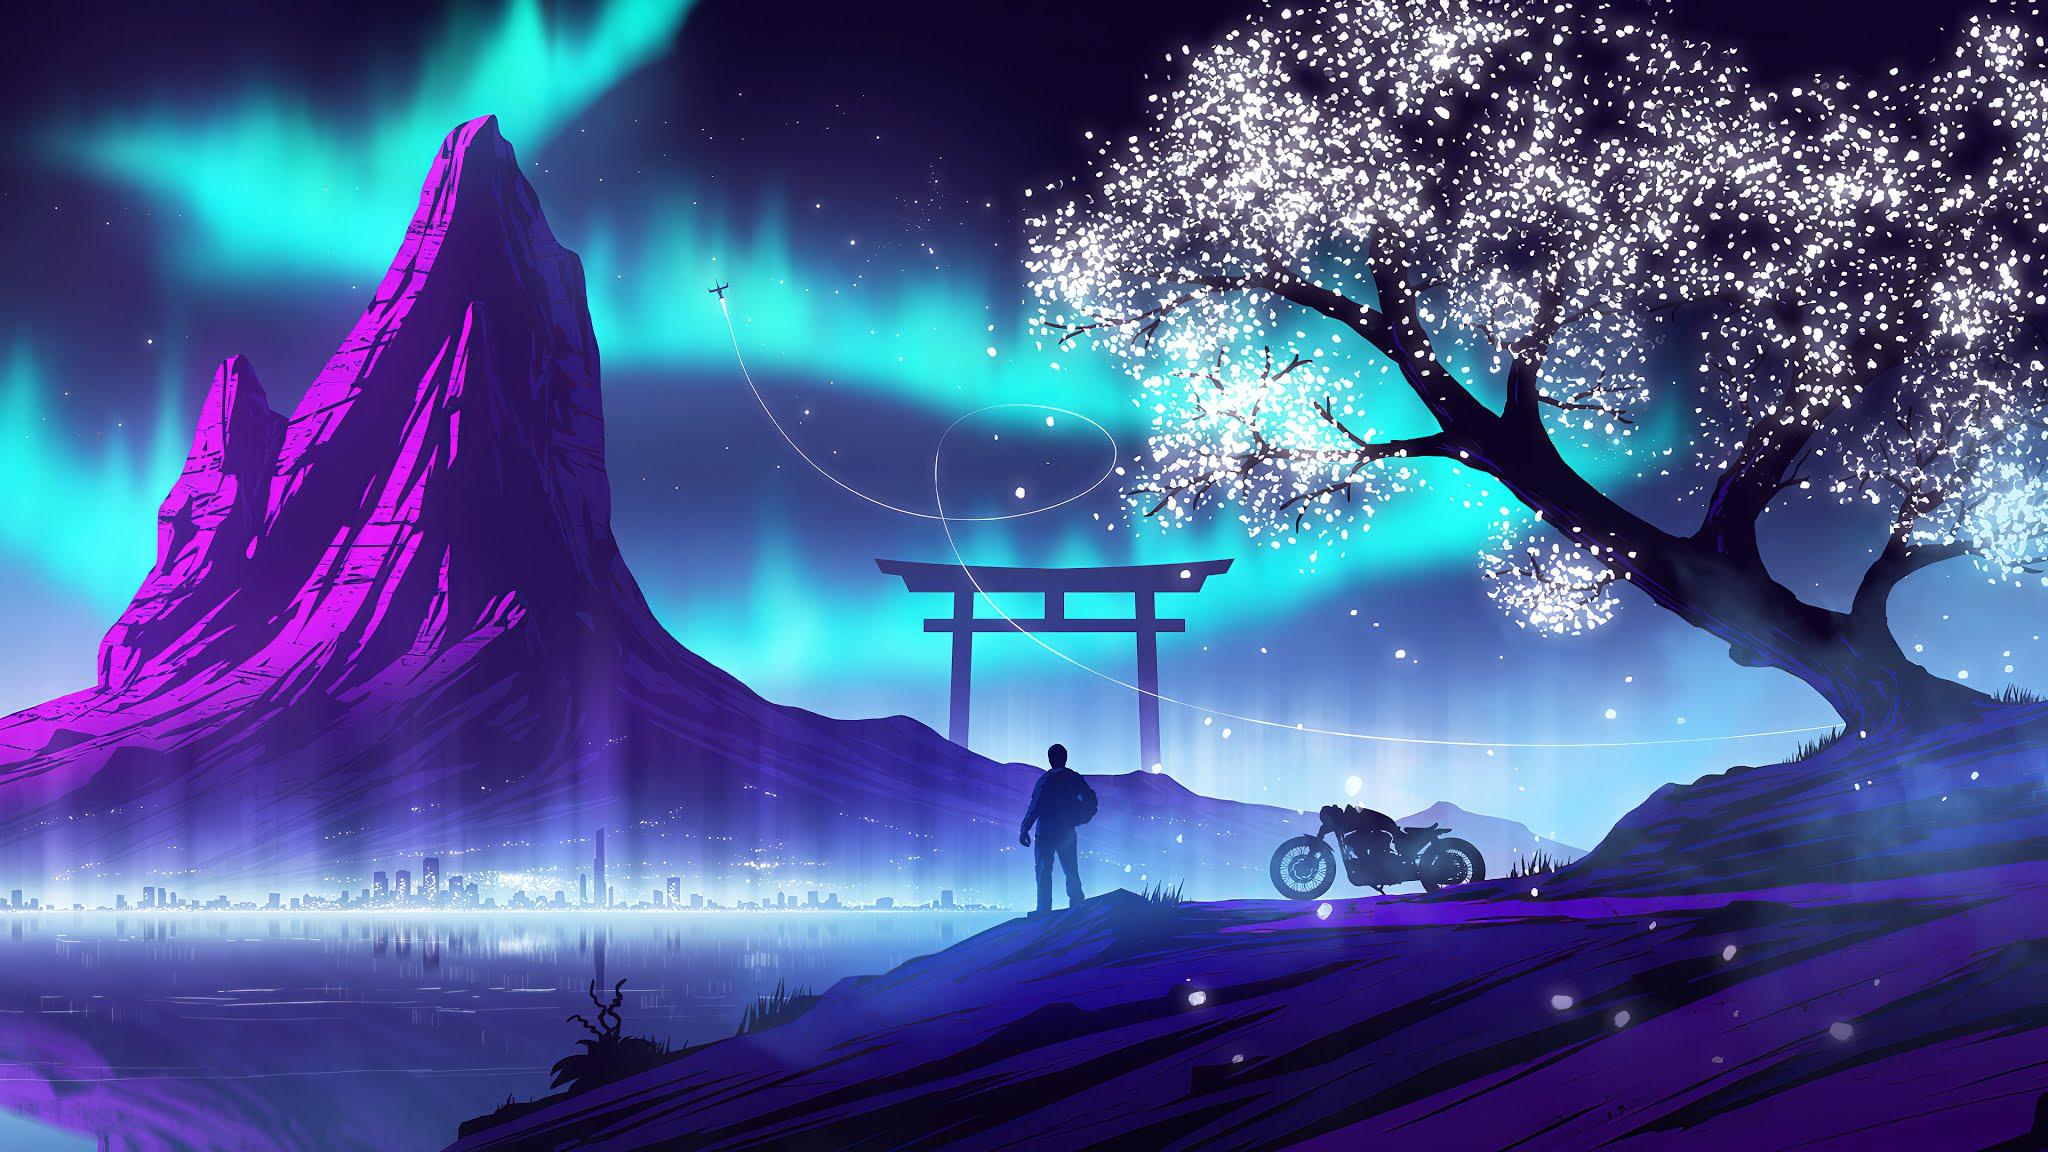 Biker Synthwave, Artwork, Digital Art, Hd, 4k